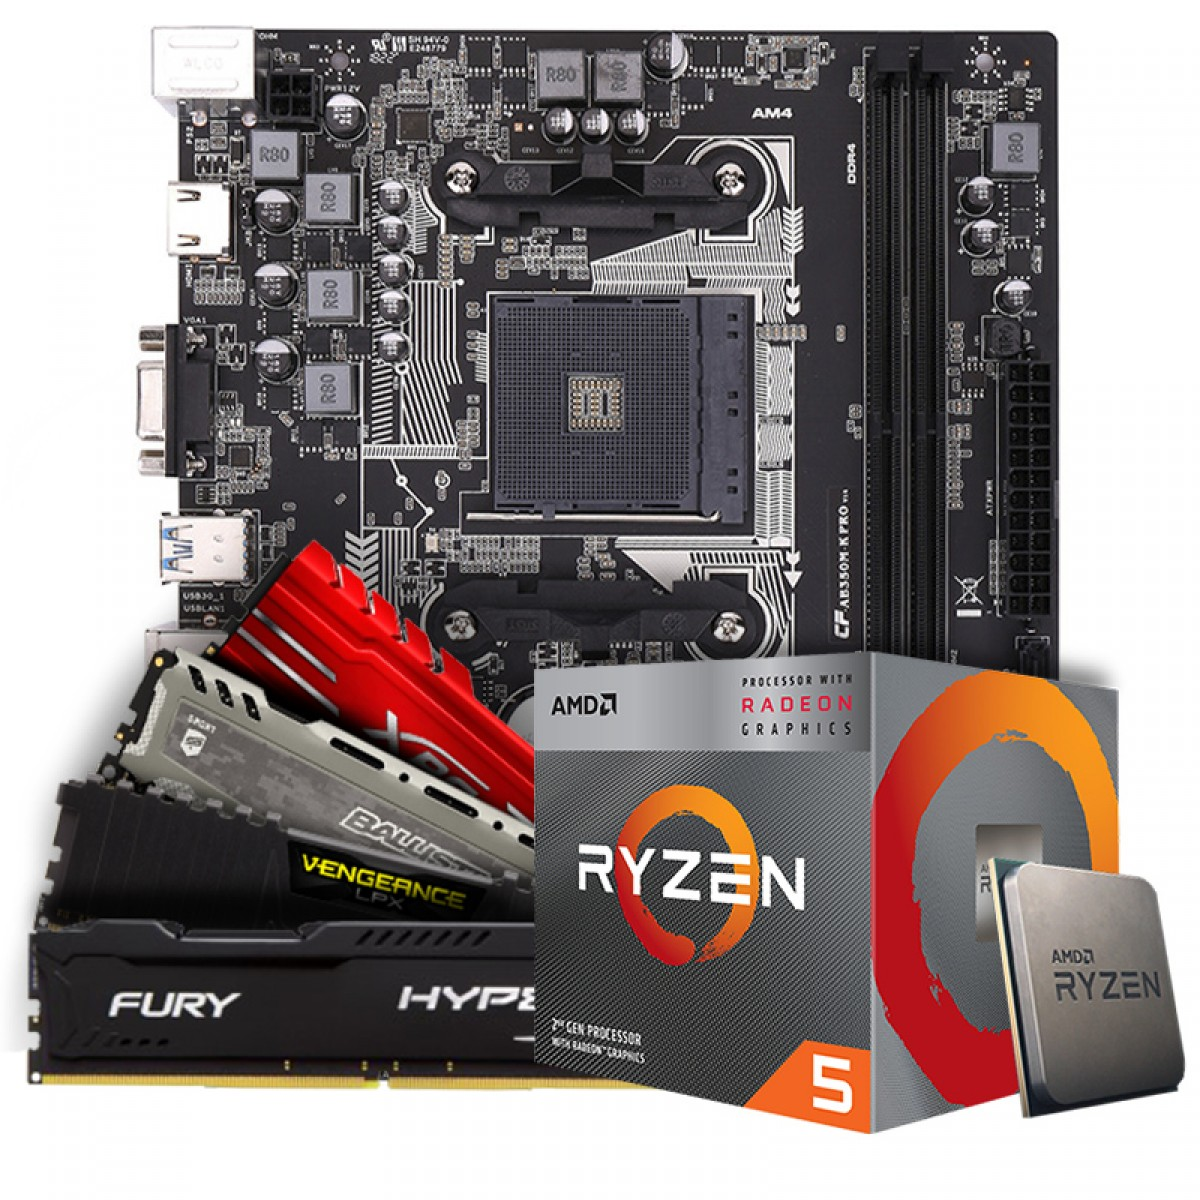 Kit Upgrade Placa Mãe Colorful AB350M-K PRO V14, AMD AM4 + Processador AMD Ryzen 5 3400G 3.7GHz + Memória DDR4 16GB (2x8GB) 3000MHz